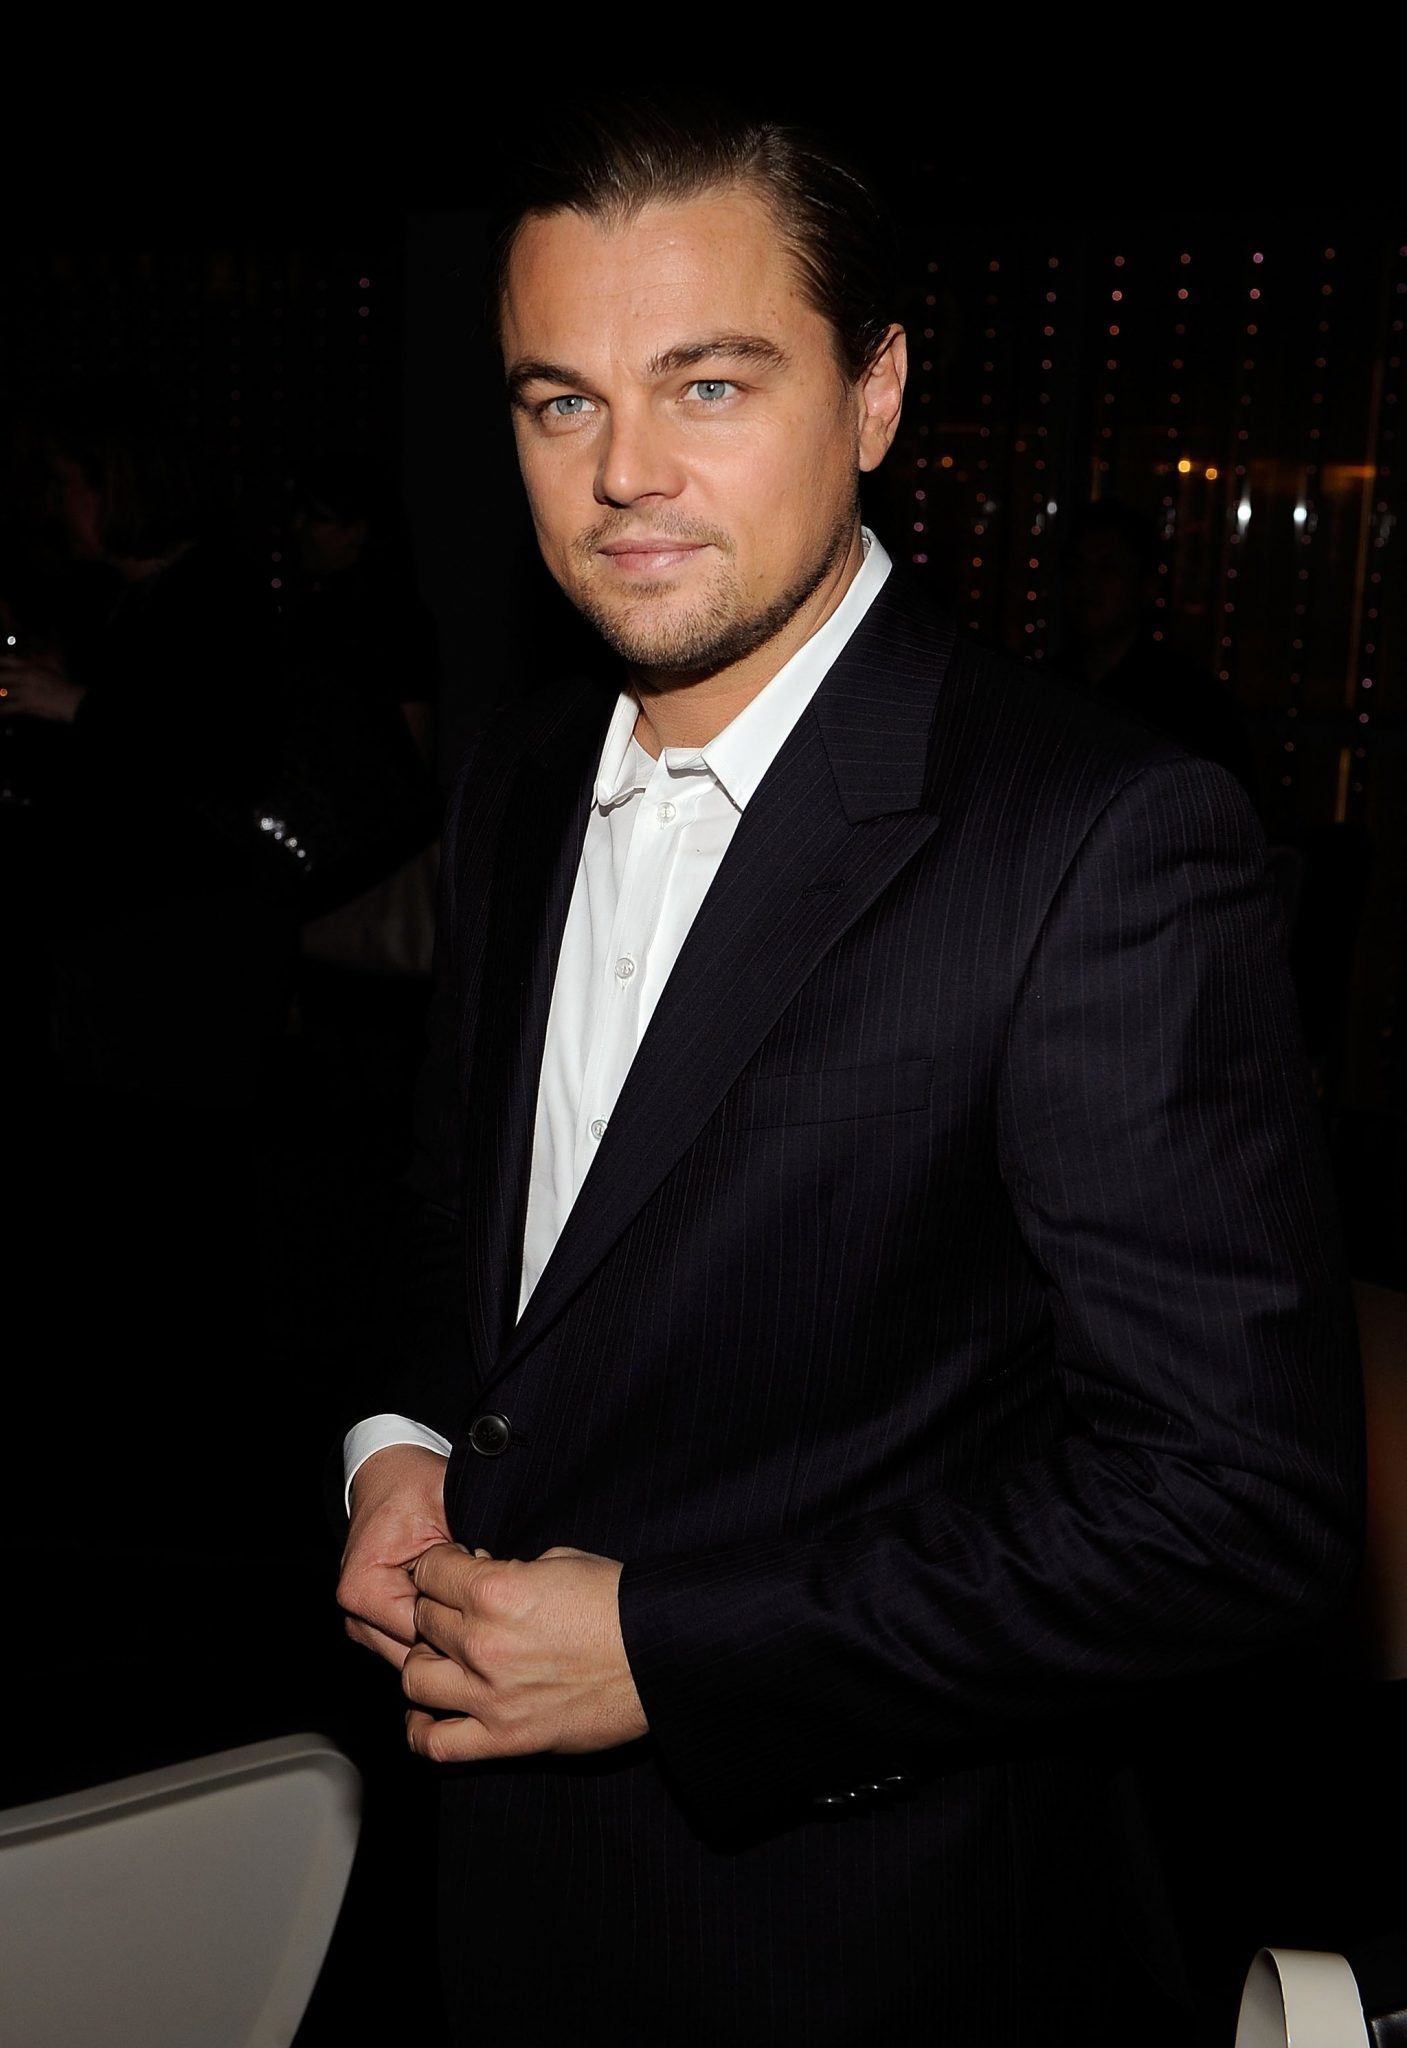 Photos-Leonardo-DiCaprio-Martin-Scorsese-Bar-Refaeli-Armani-Party-Premiere-Shutter-Island-2010-02-17-140022